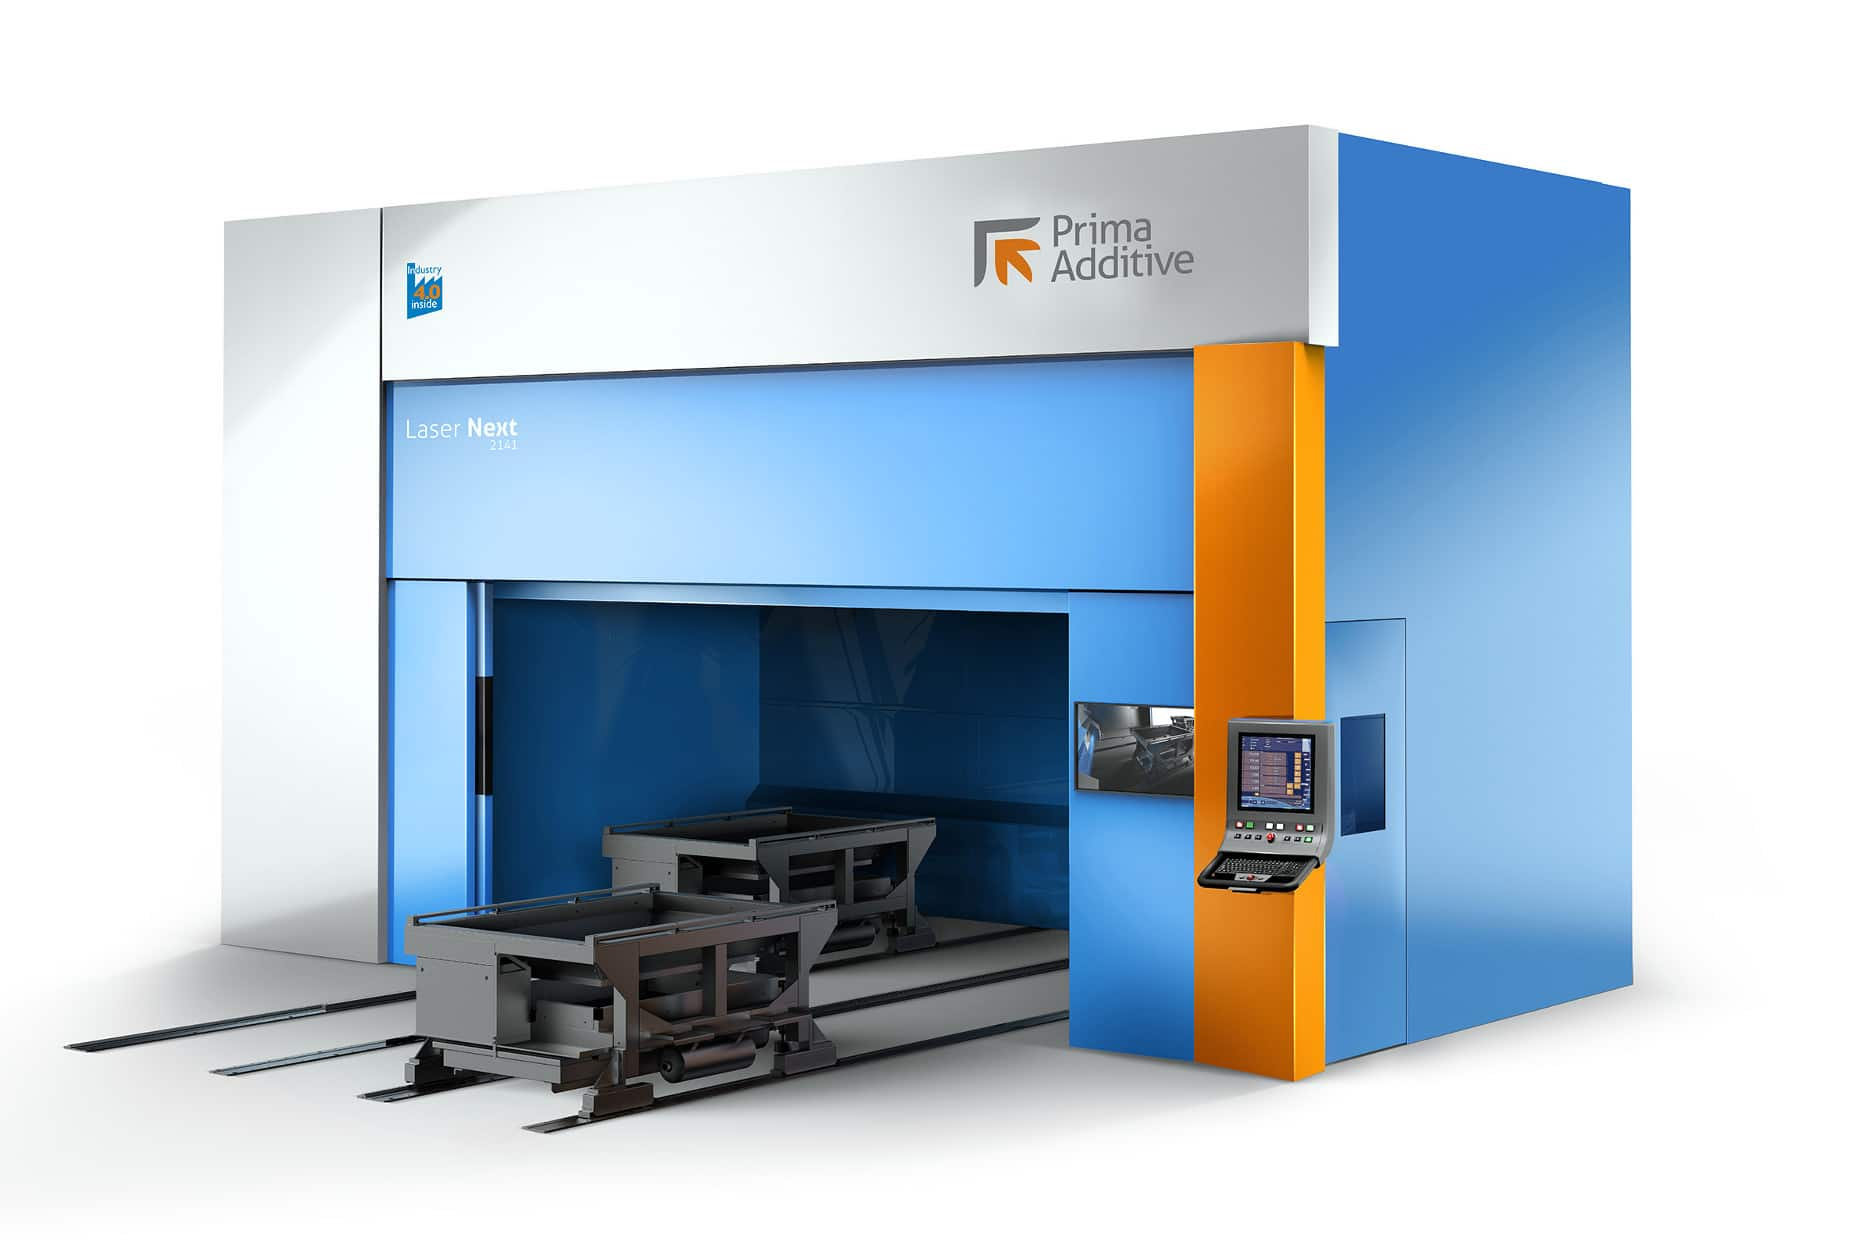 Laser Next 2141 Prima Additive - Imprimantes 3D